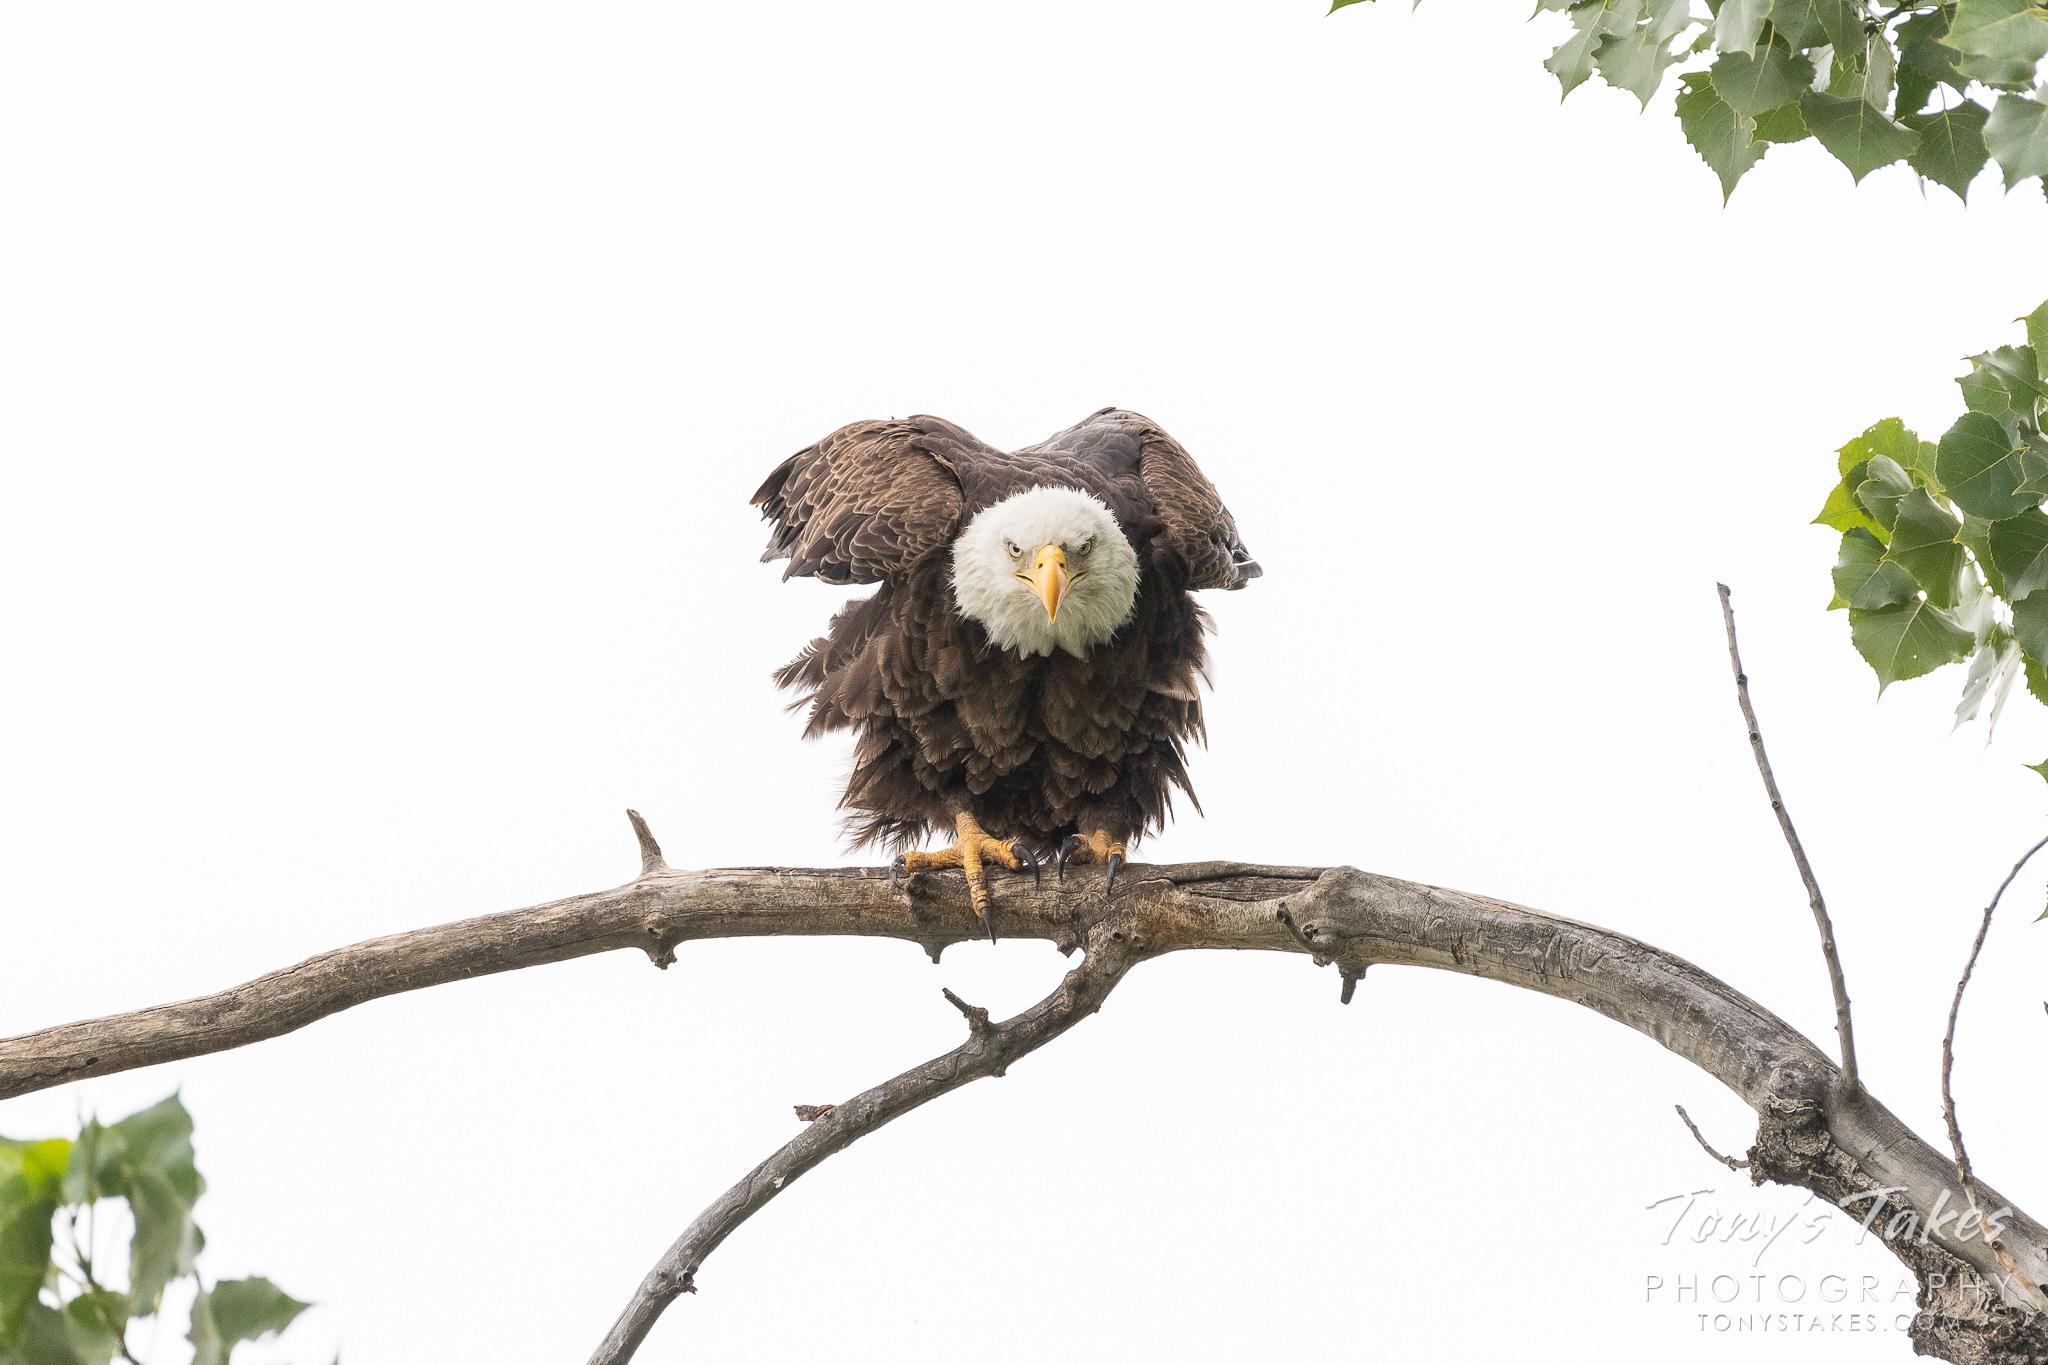 Bald Eagle gets serious